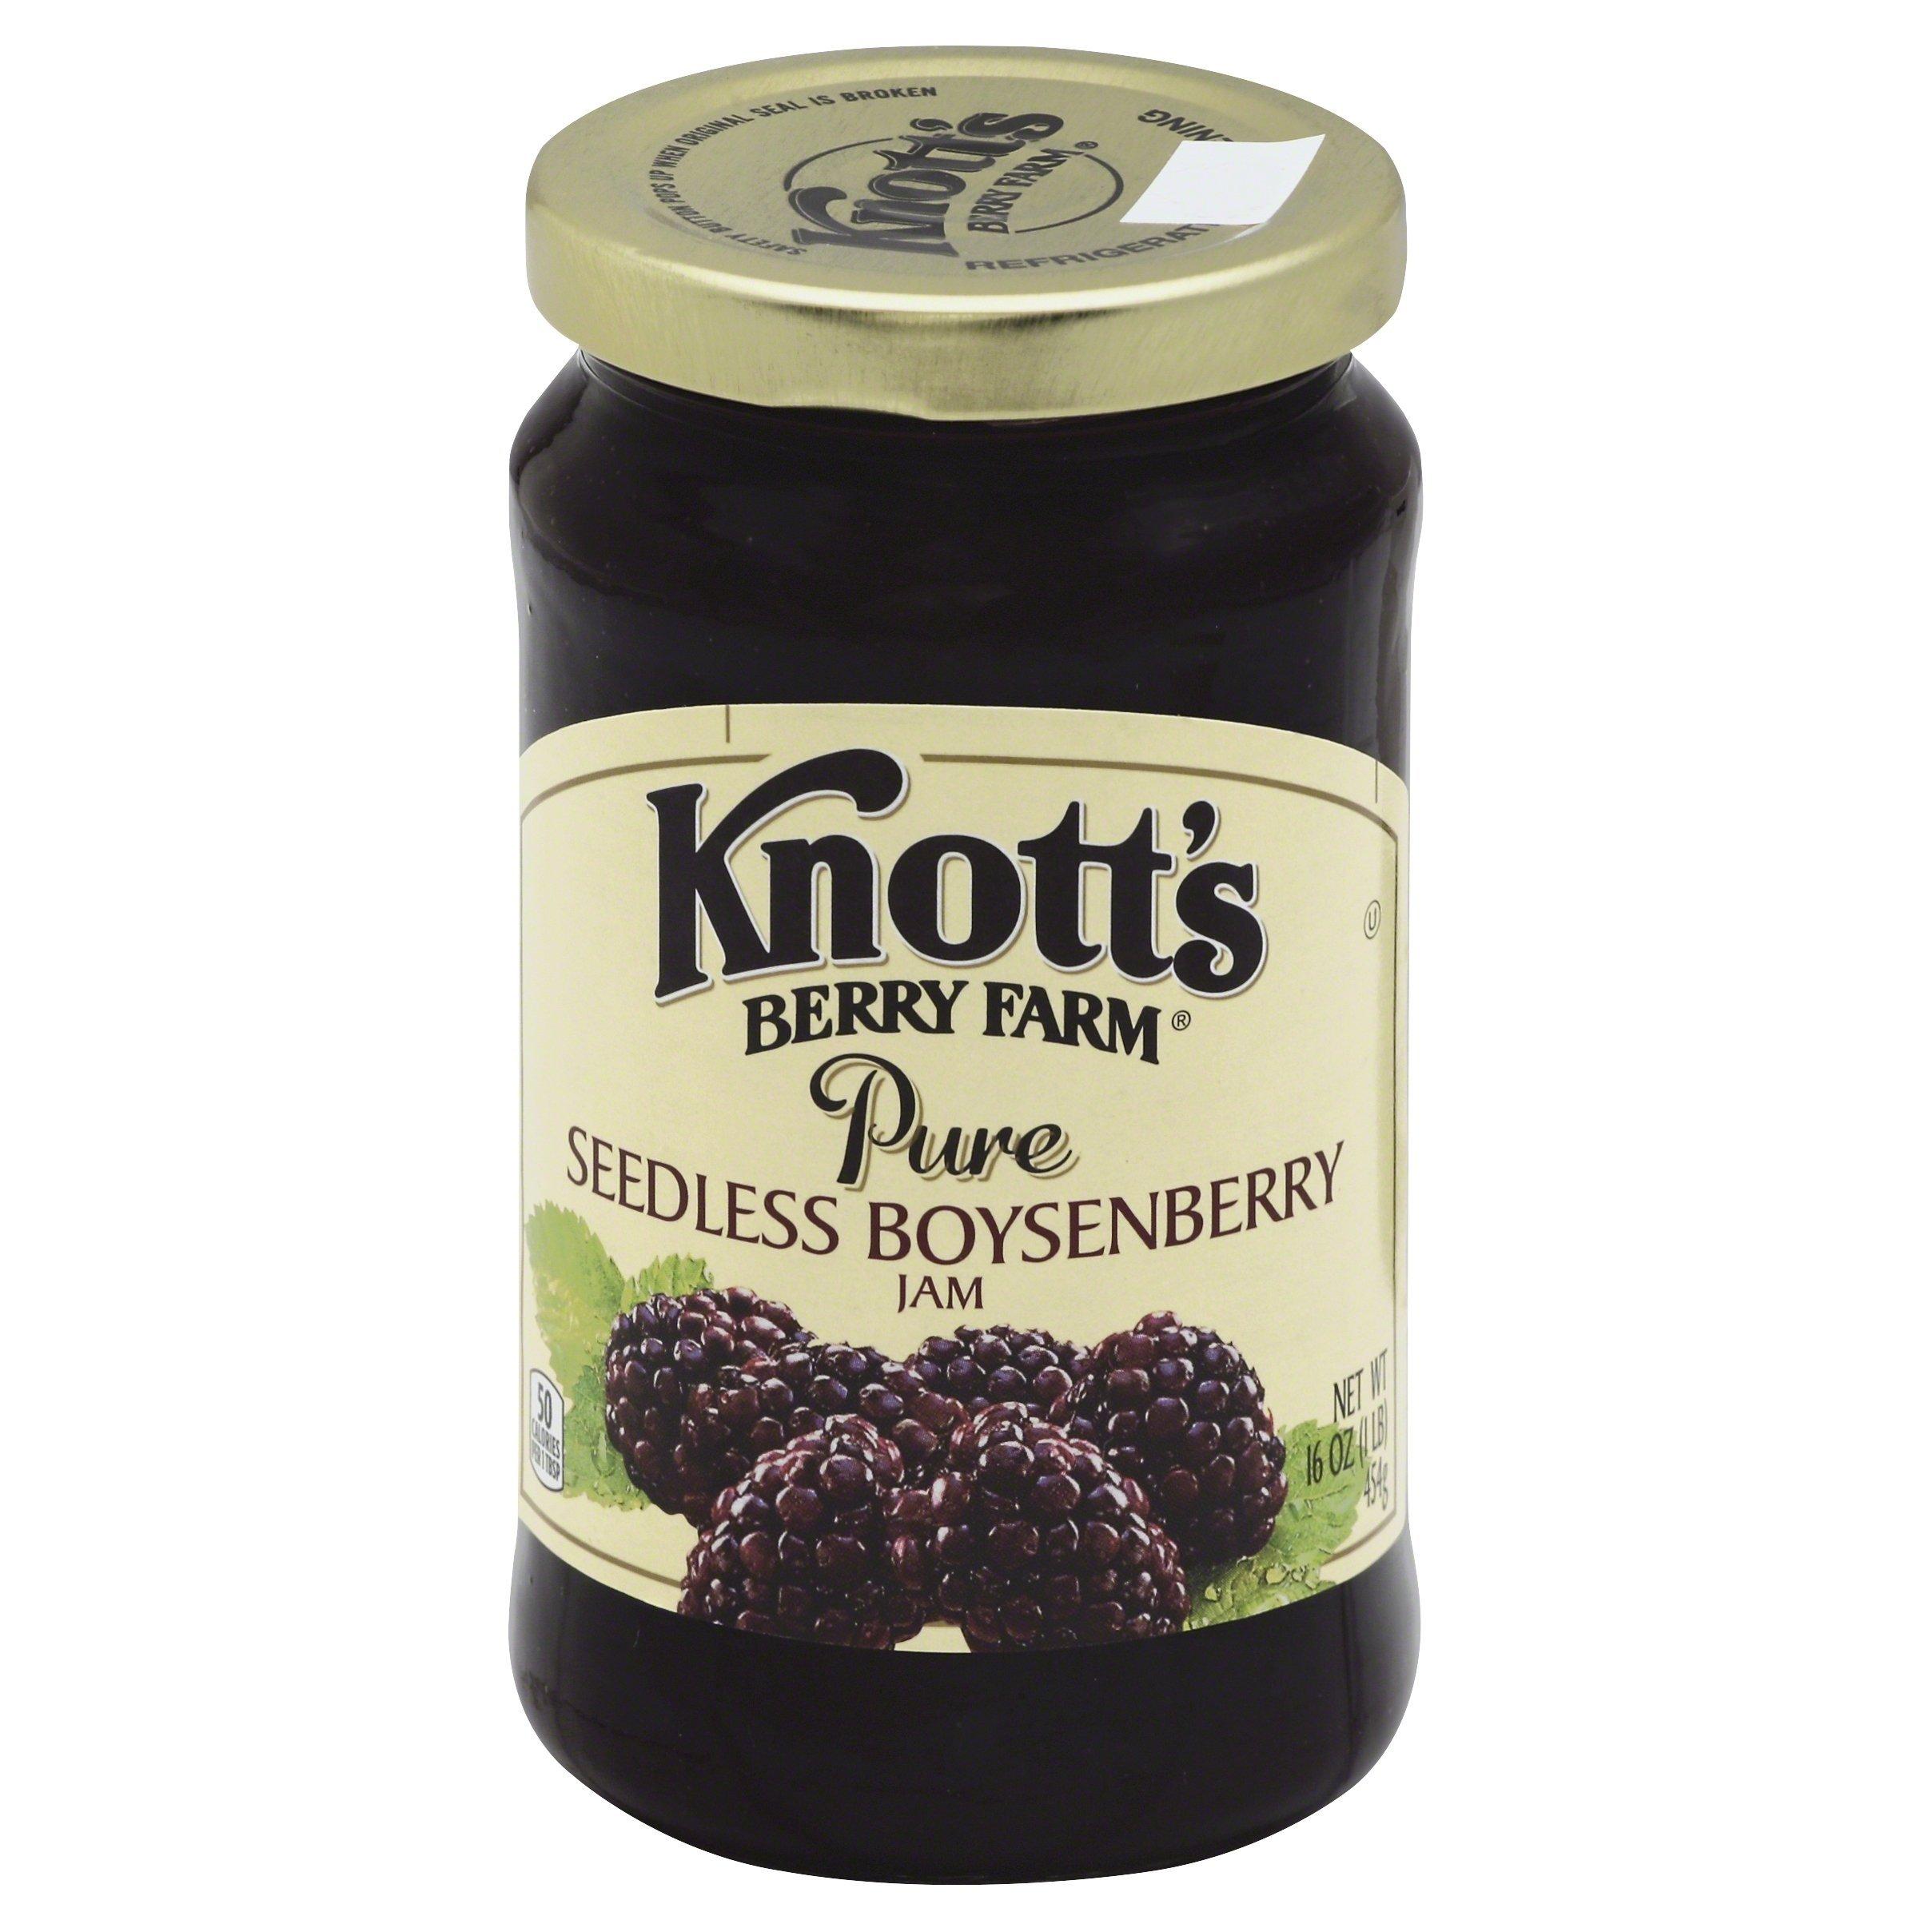 Knott's Berry Farm Pure Seedless Boysenberry Jam, 16 Ounce by Knott's (Image #1)